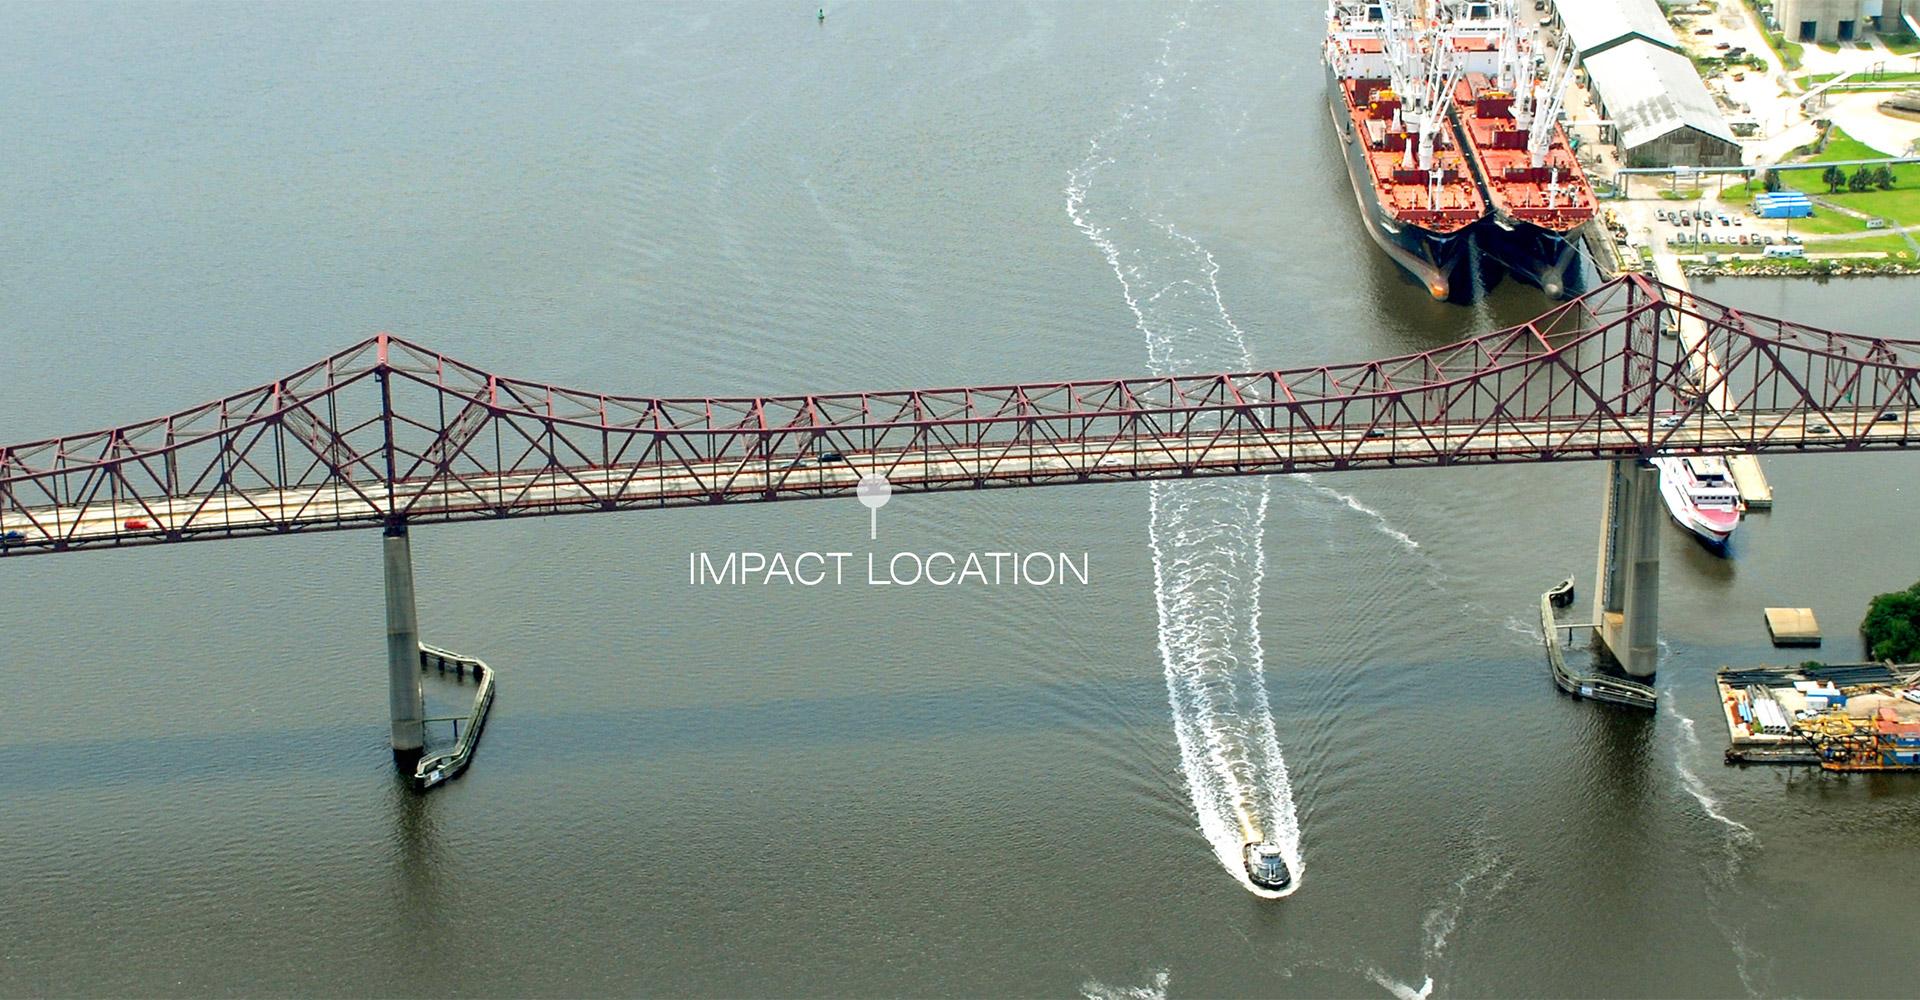 Aerial of impact location on Mathews Bridge.